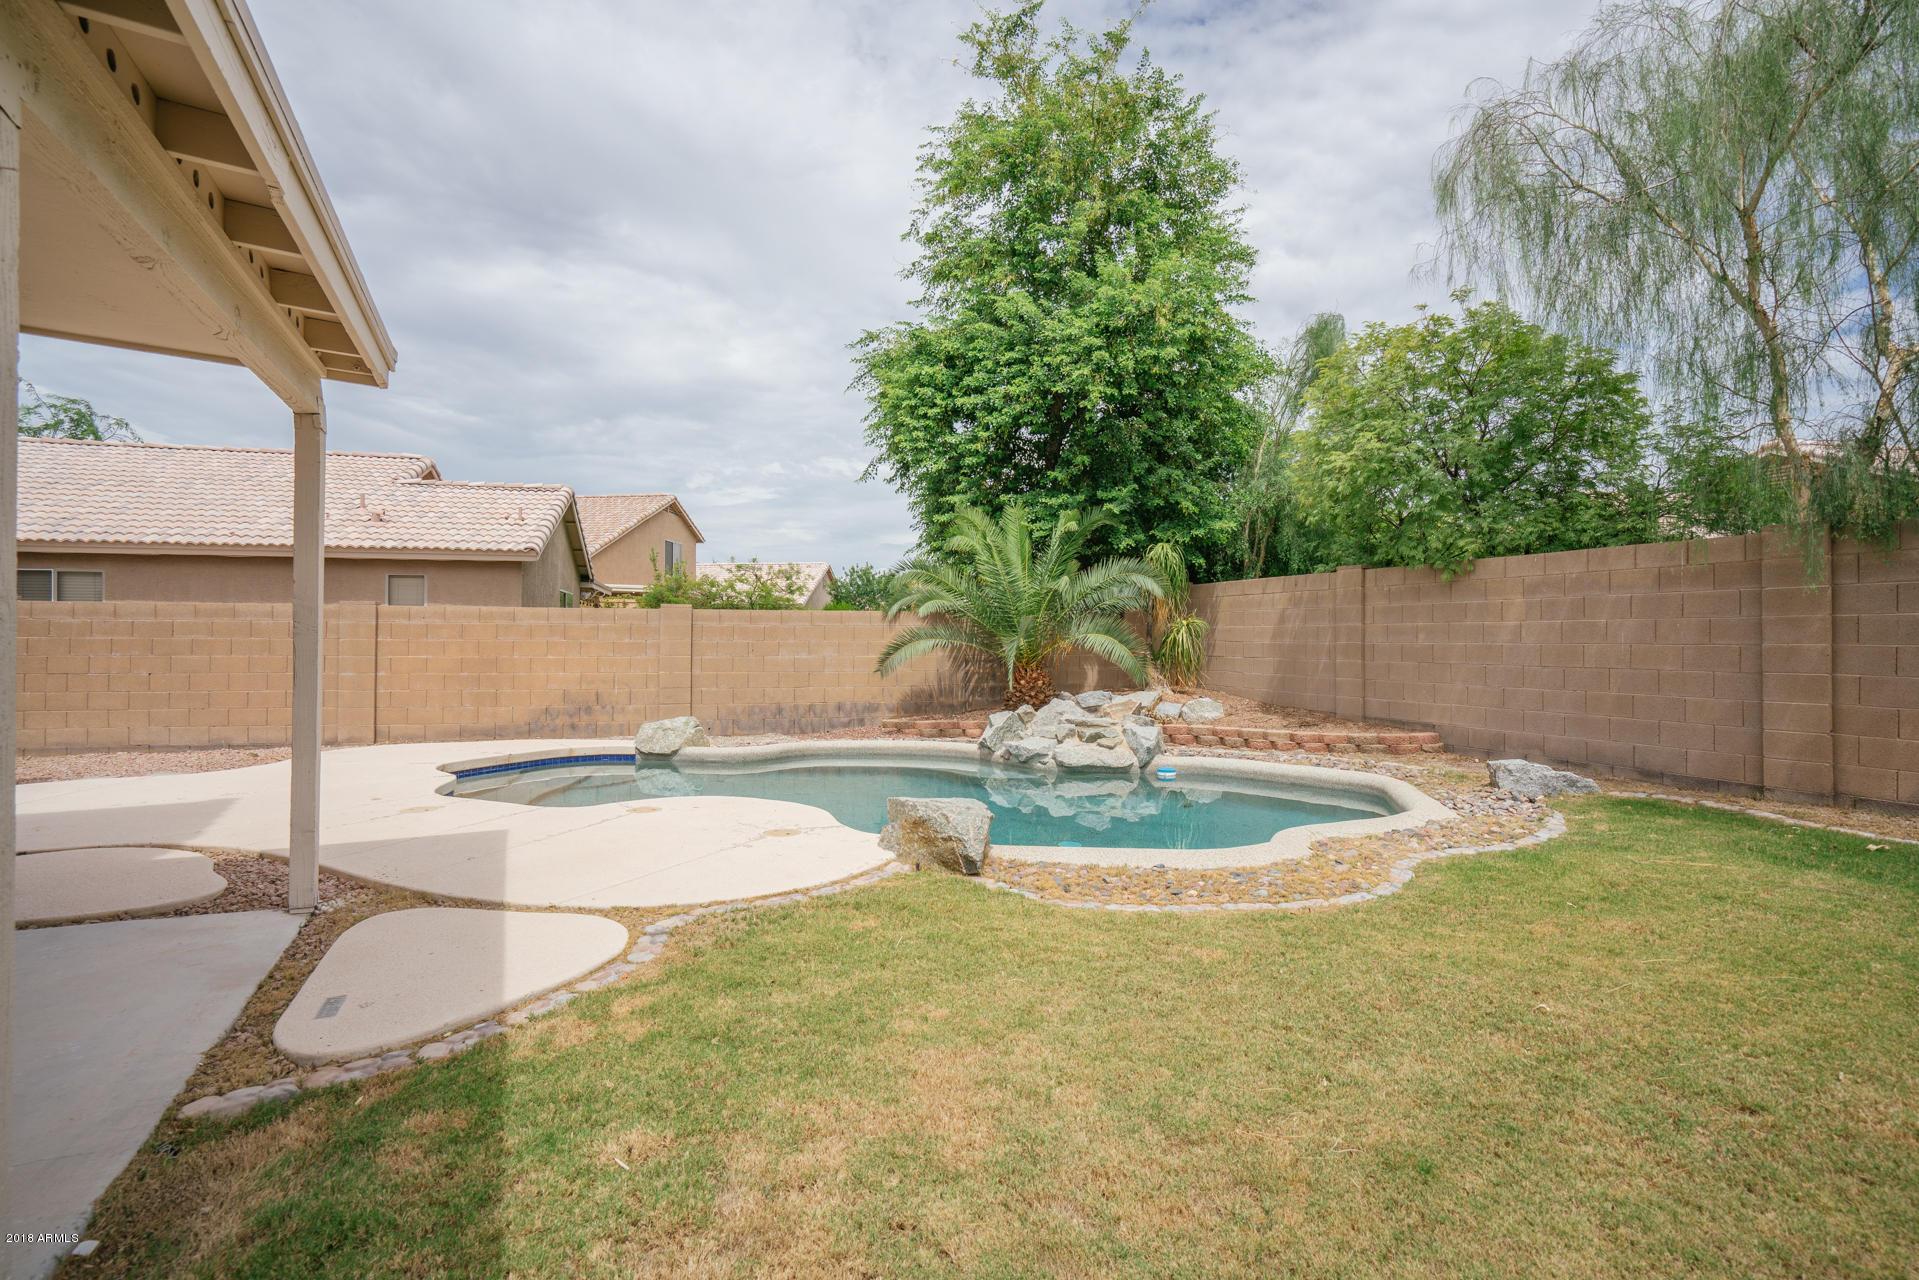 MLS 5795779 2241 E SOFT WIND Drive, Phoenix, AZ 85024 Phoenix AZ Mountaingate